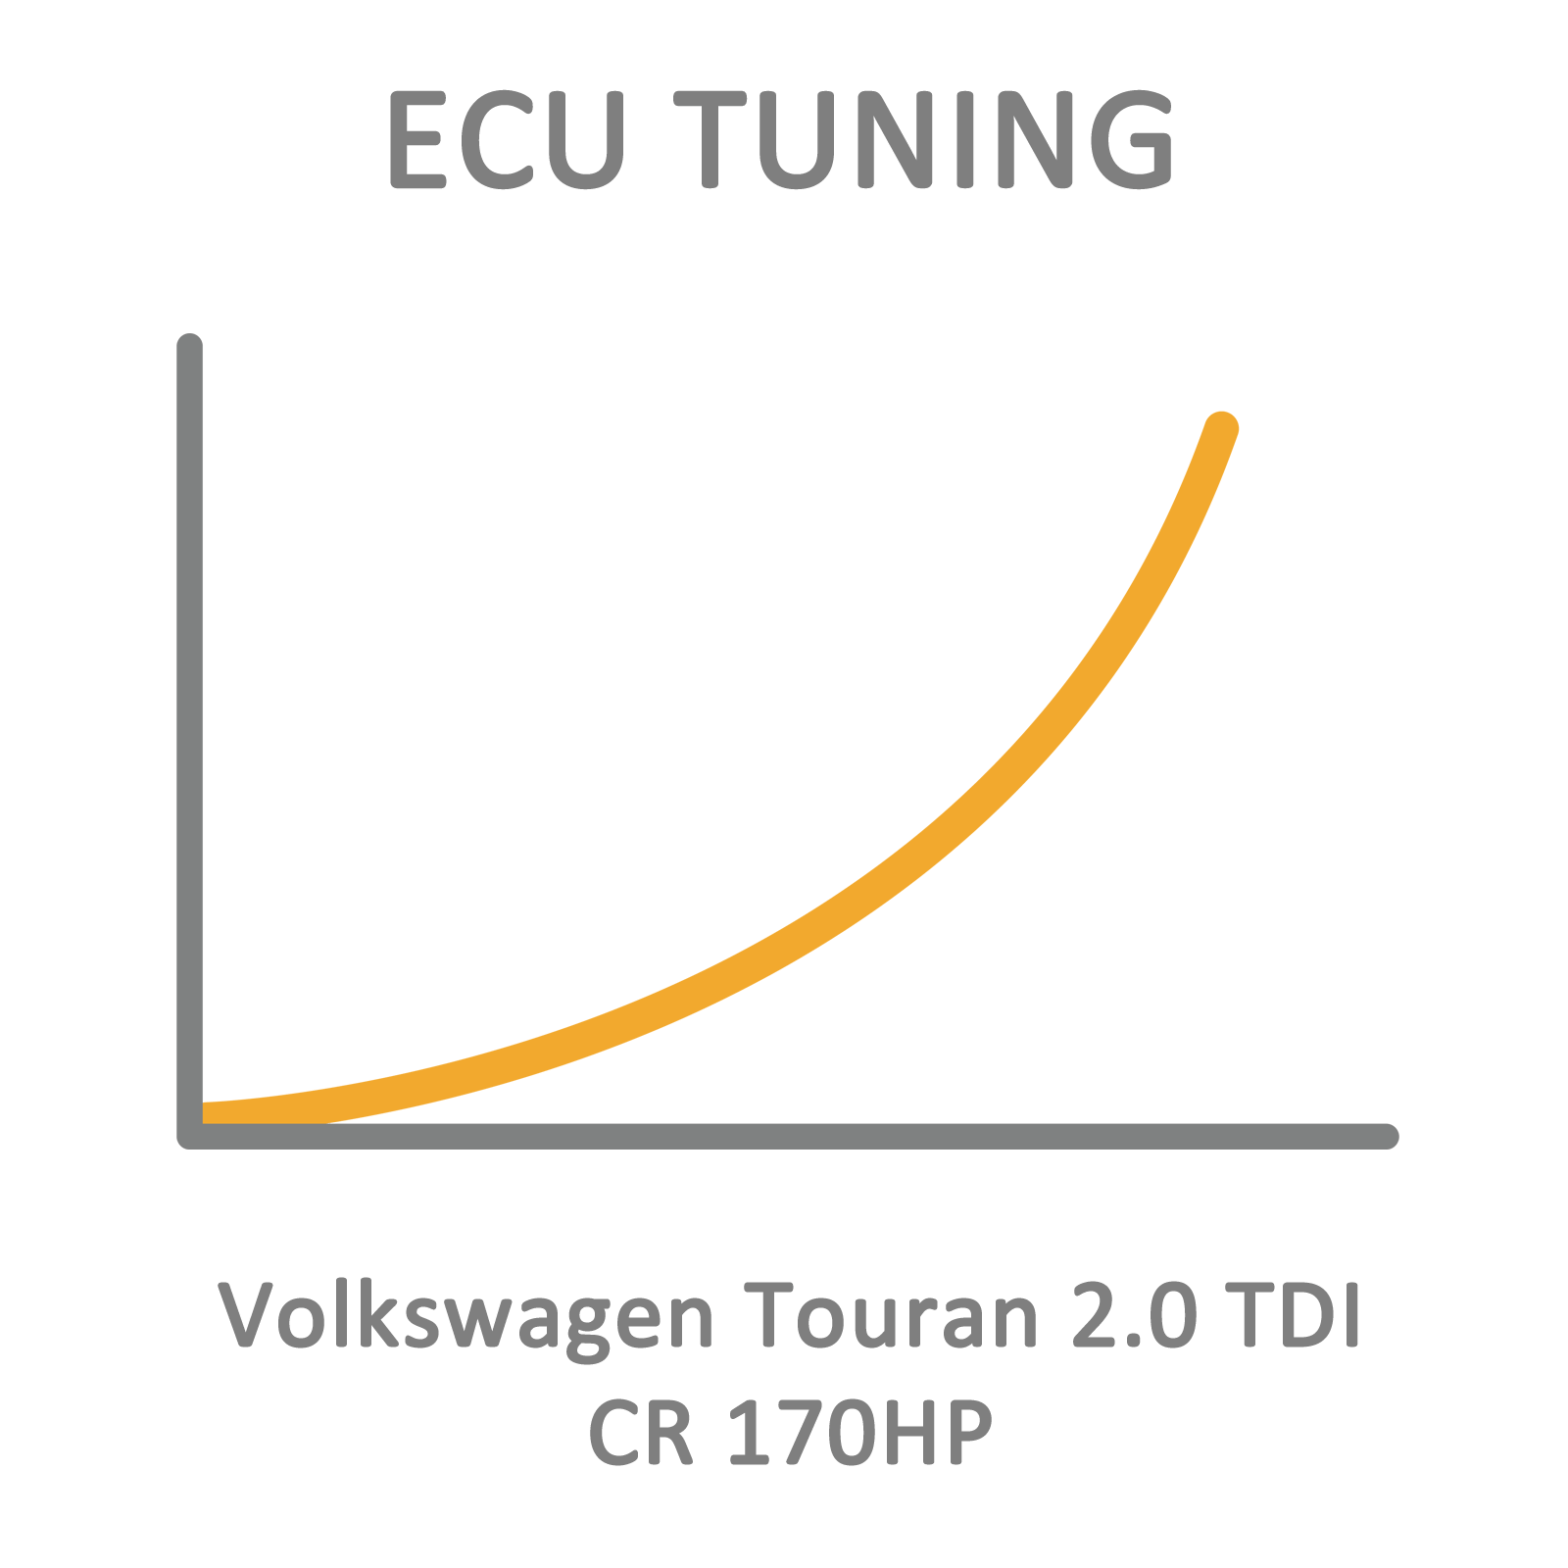 Volkswagen Touran 2.0 TDI CR 170HP ECU Tuning Remapping